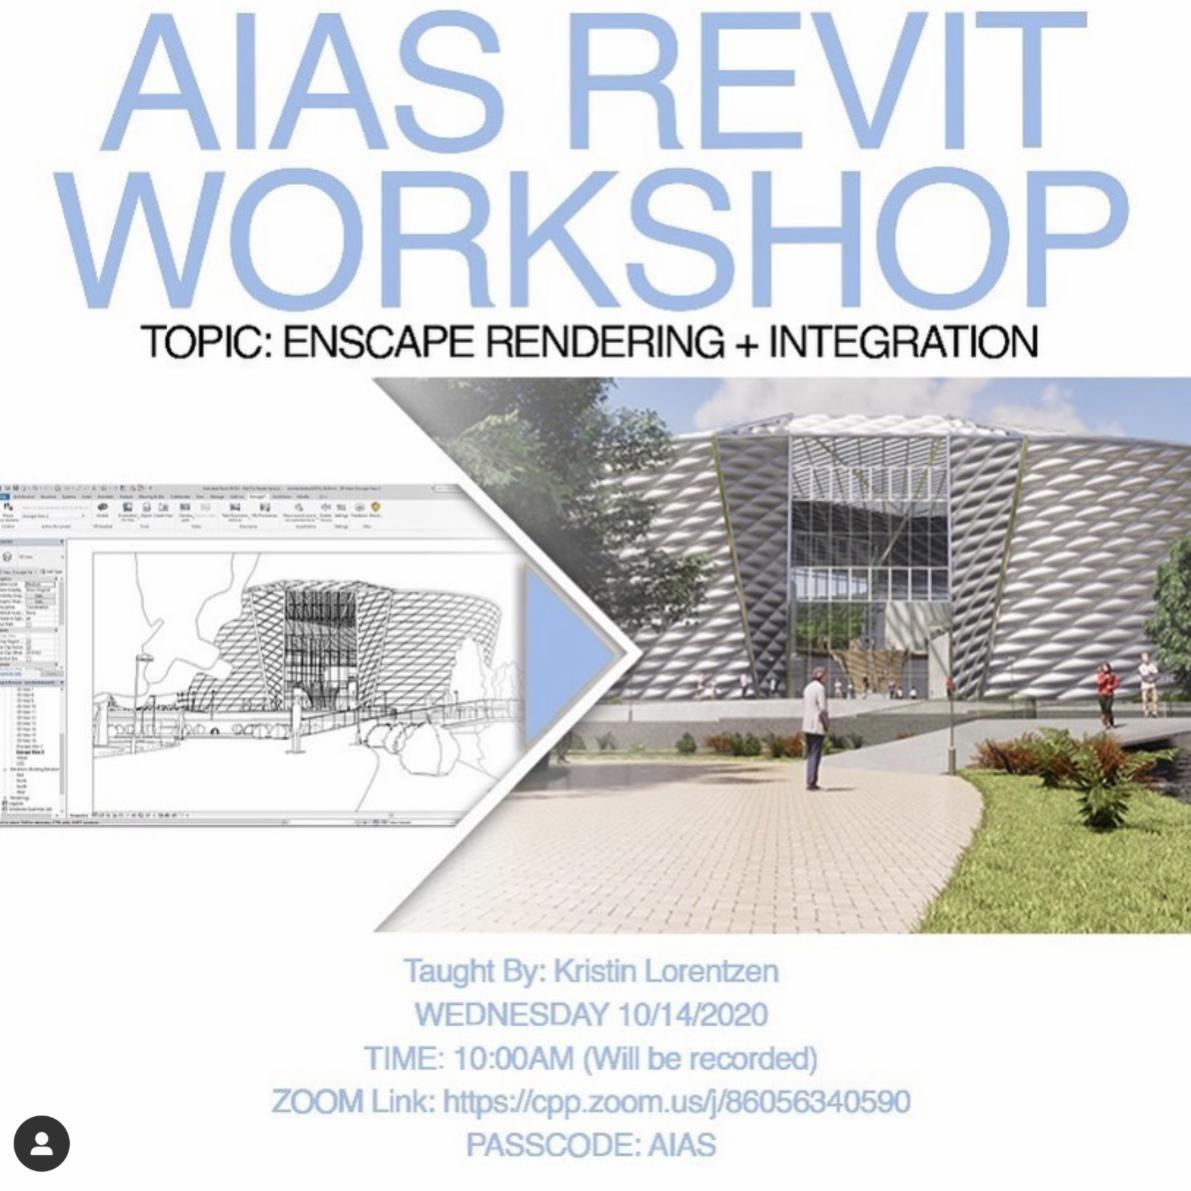 aias revit workshop taught by kristin lorentzen